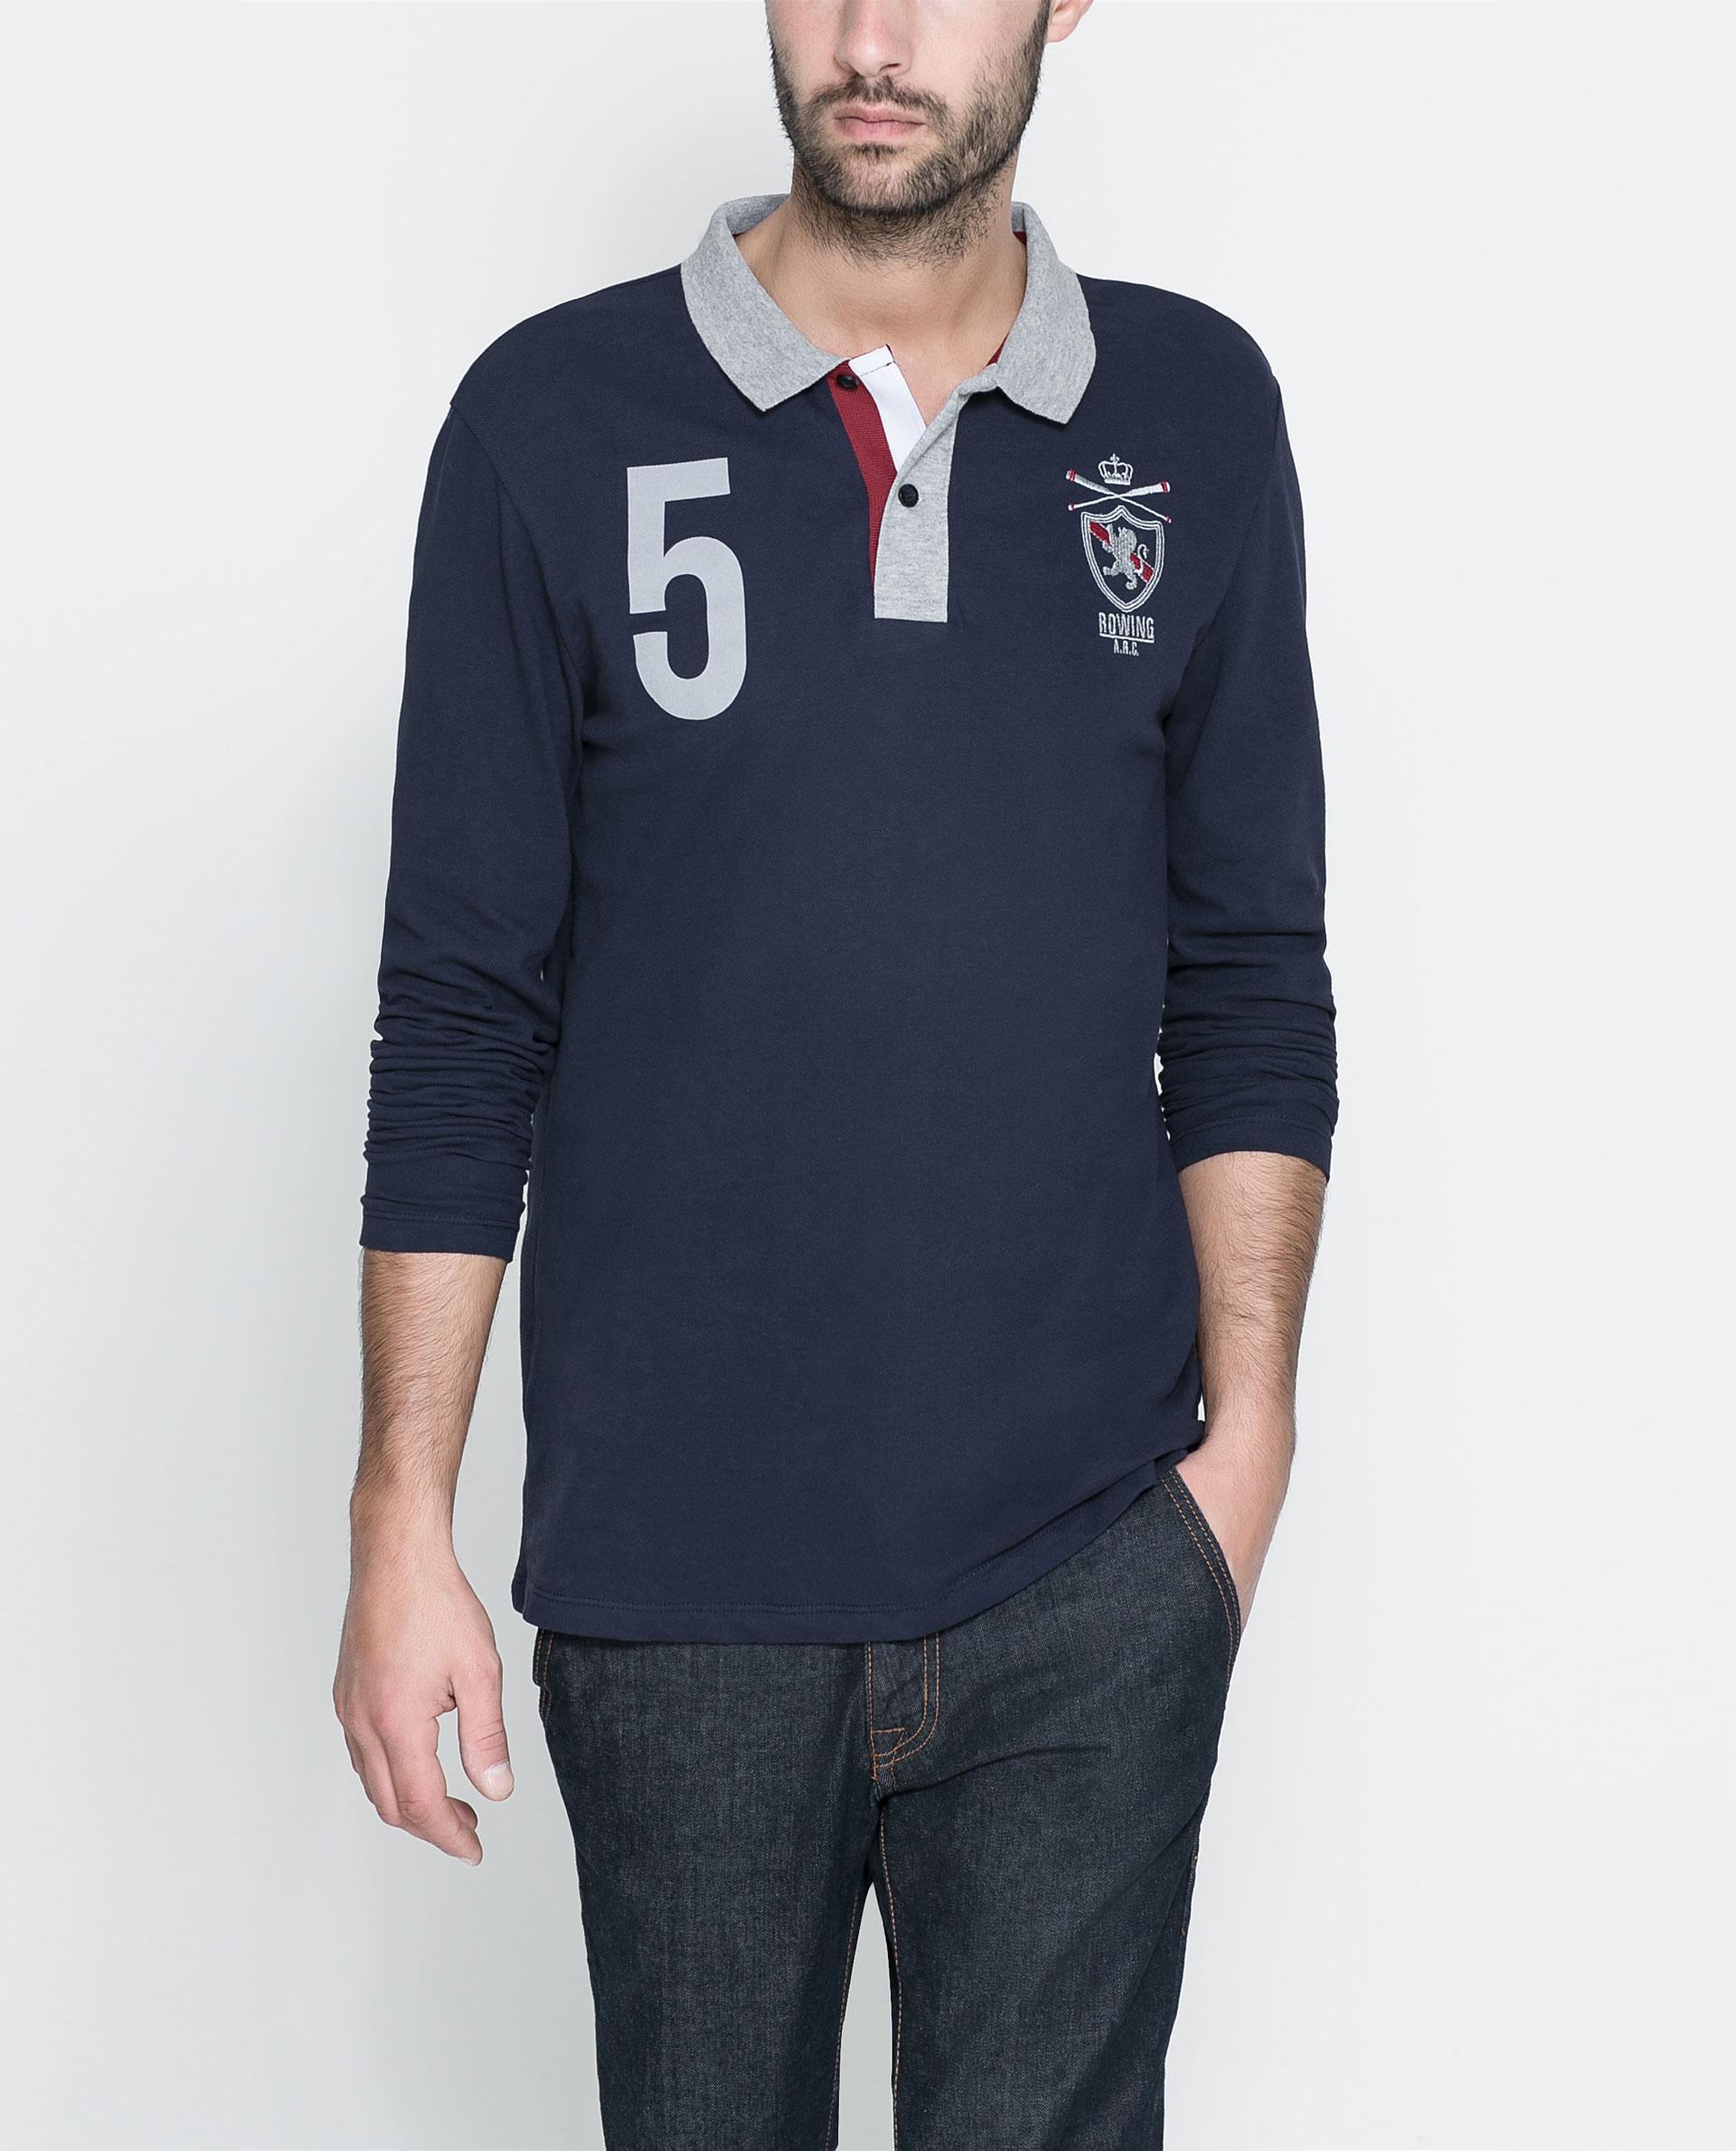 Zara Long Sleeve Polo Shirt In Blue For Men Navy Blue Lyst